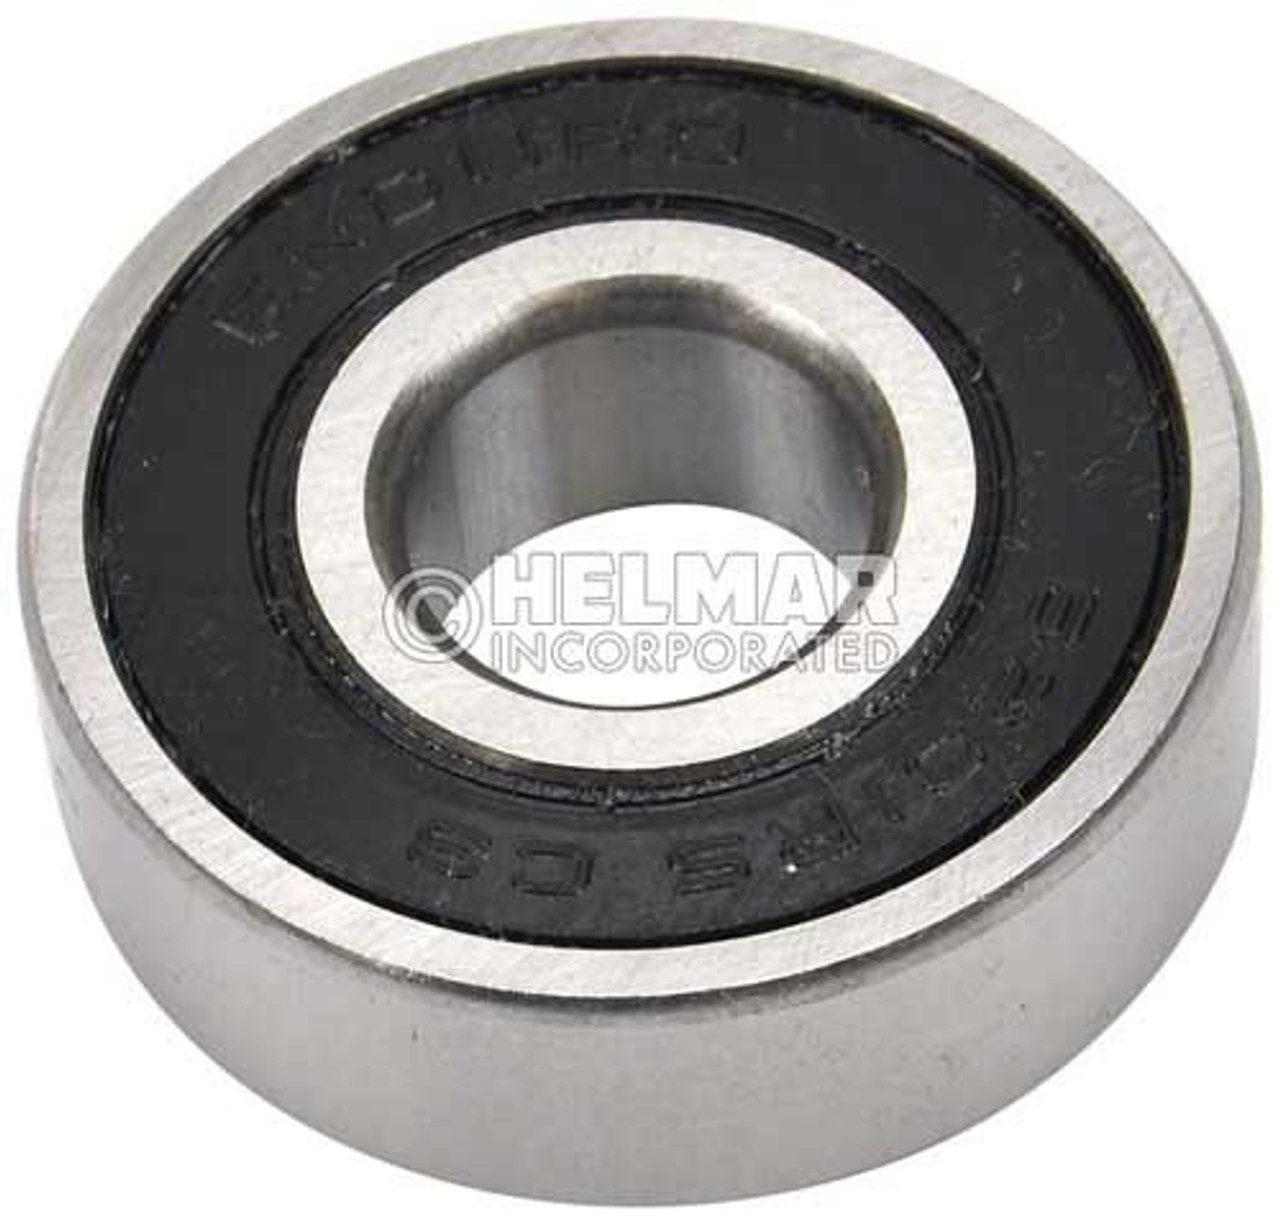 6201-2RS Universal Wheel Bearing Assembly